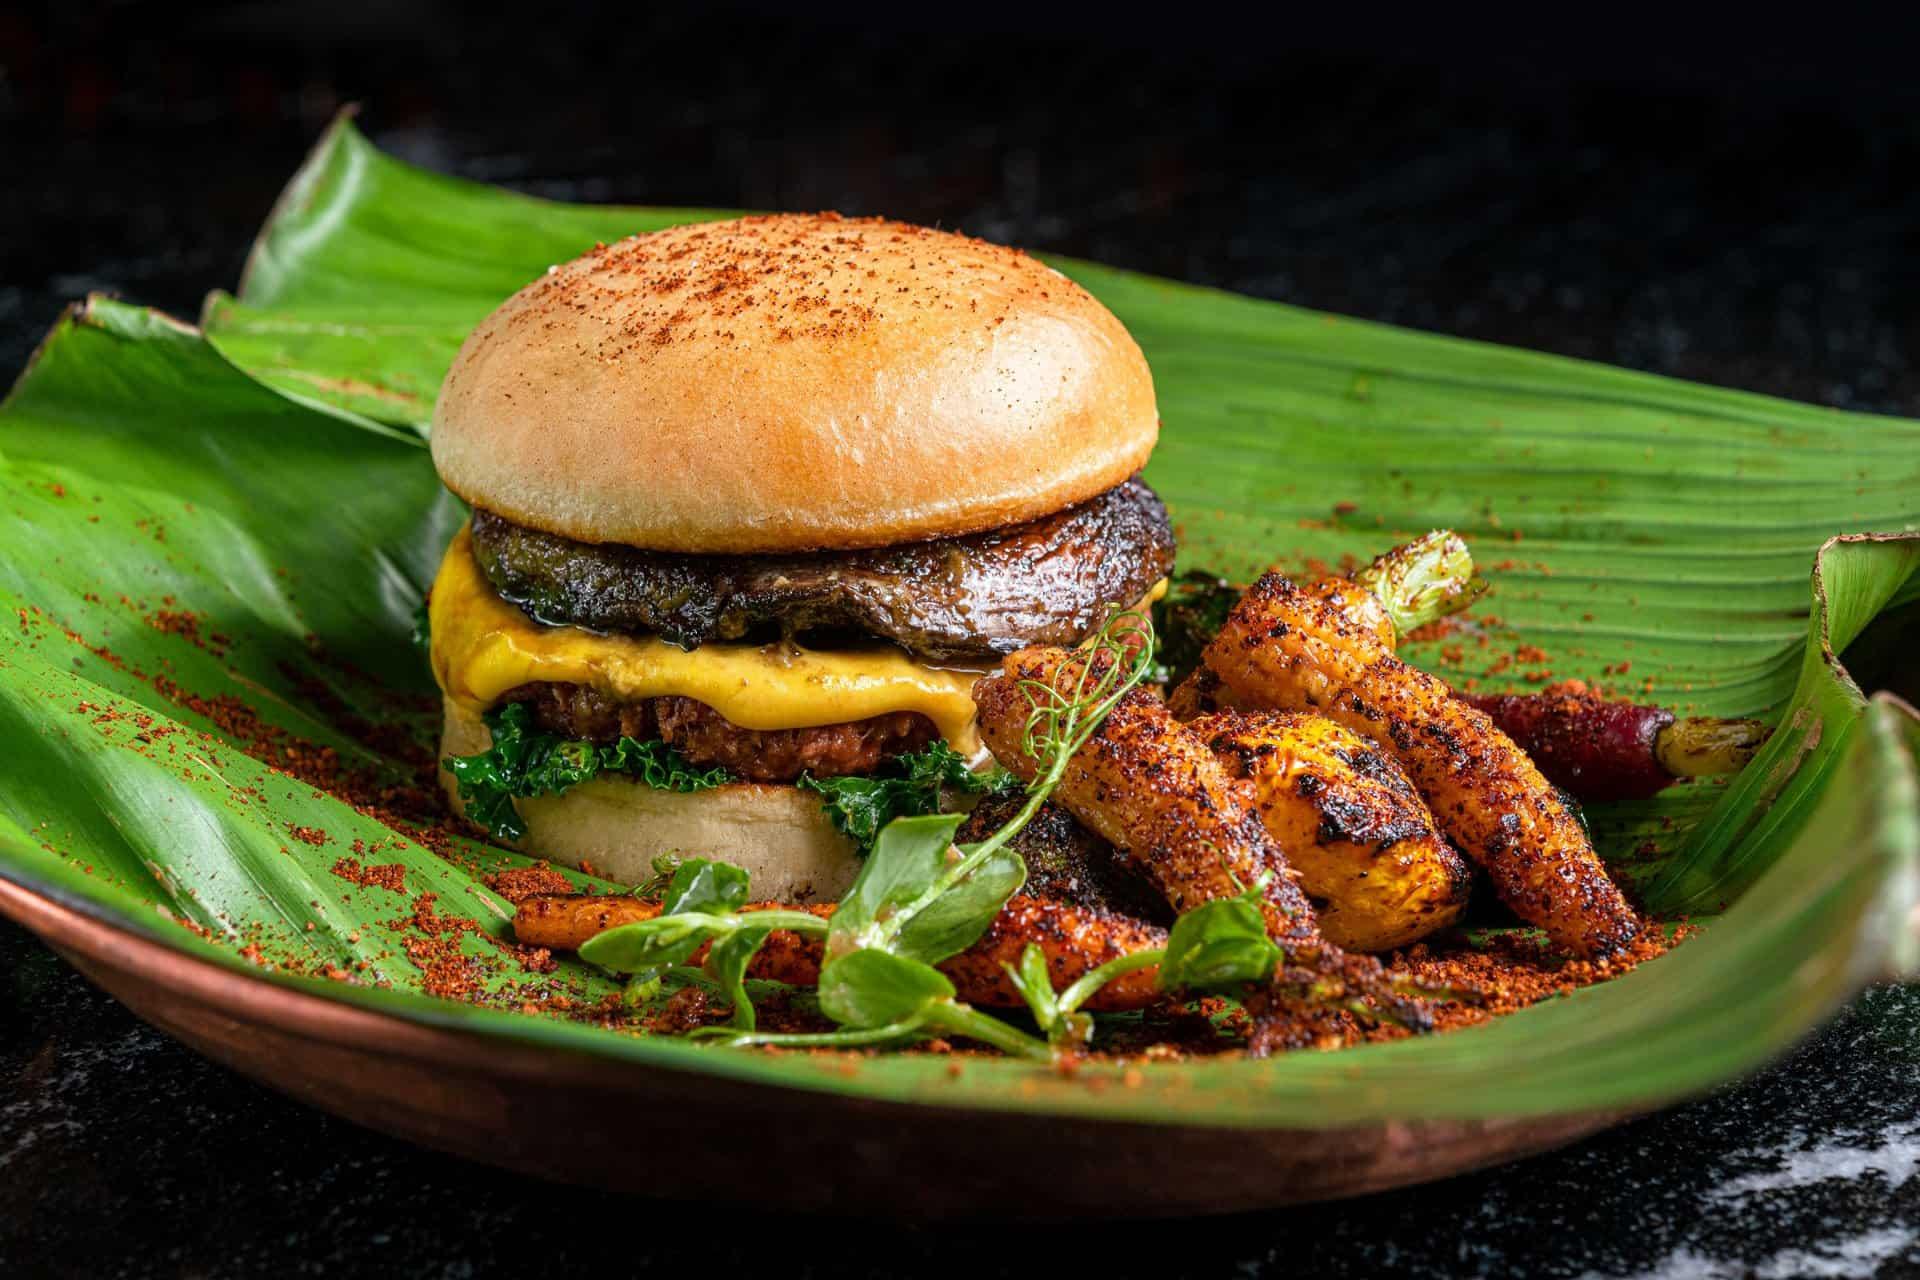 comer-hamburguesas-veganas-en-cdmx